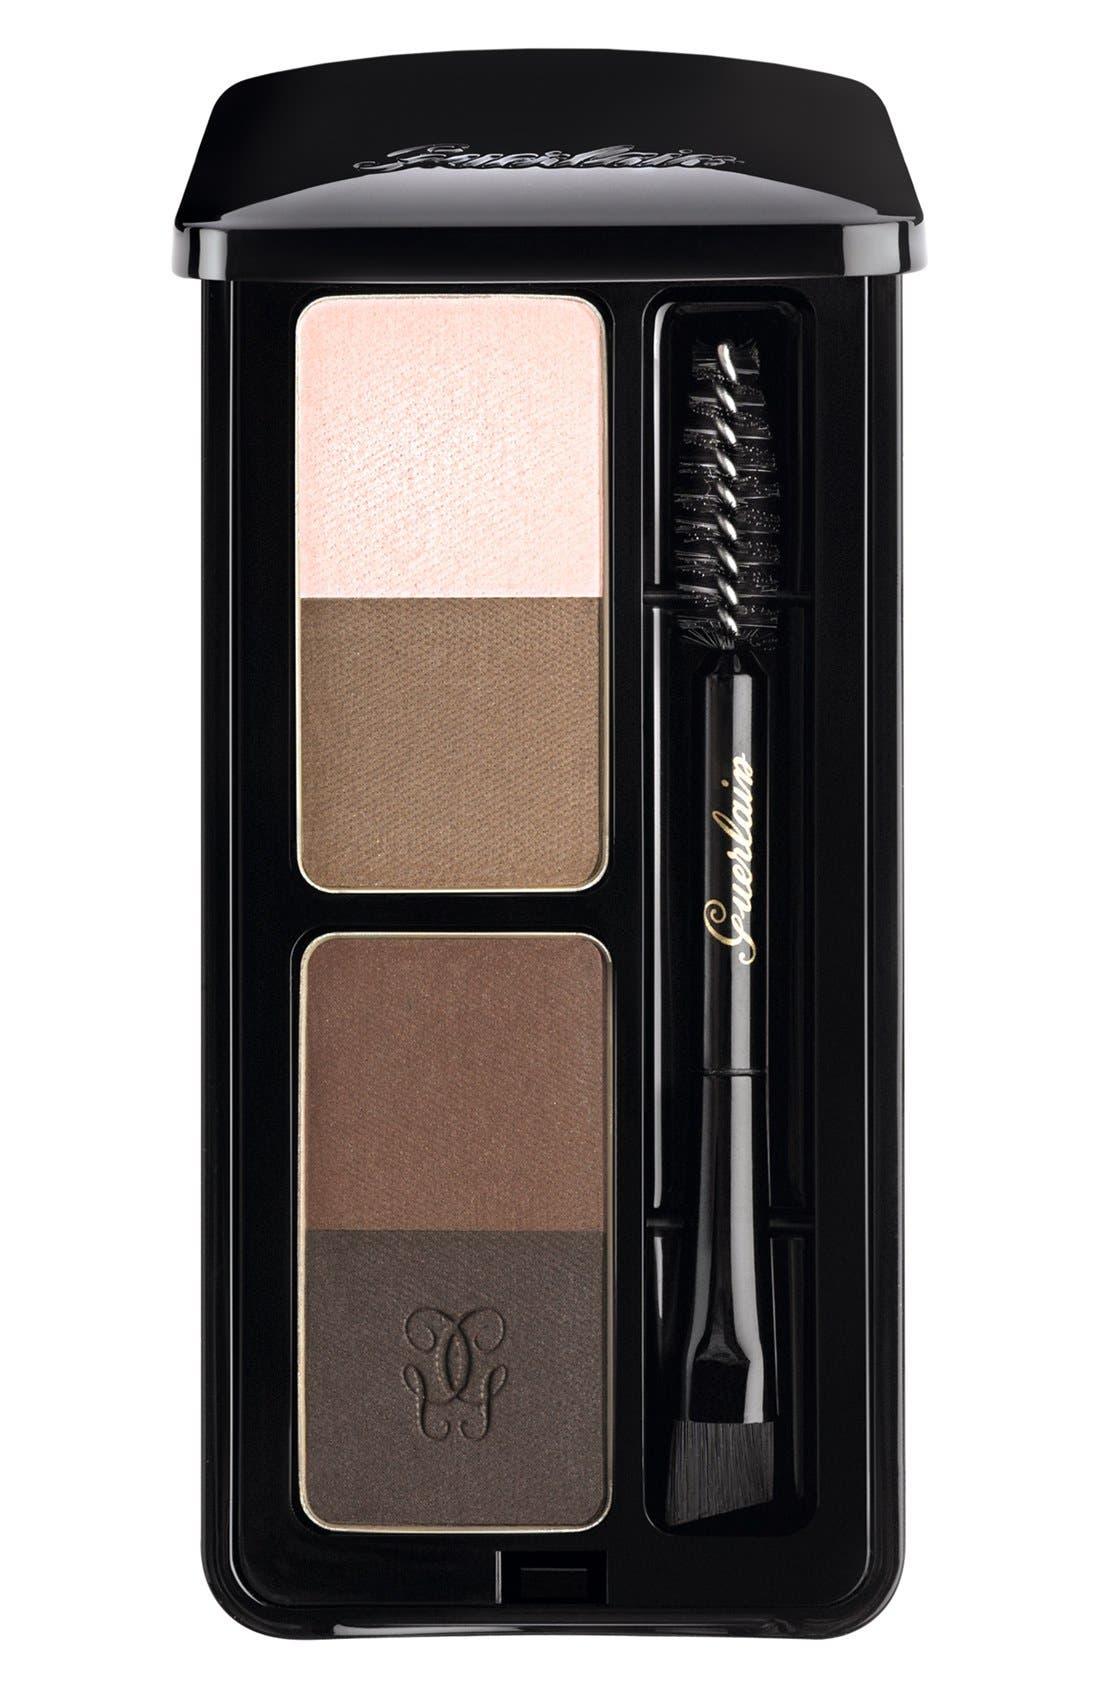 Guerlain Eyebrow Kit